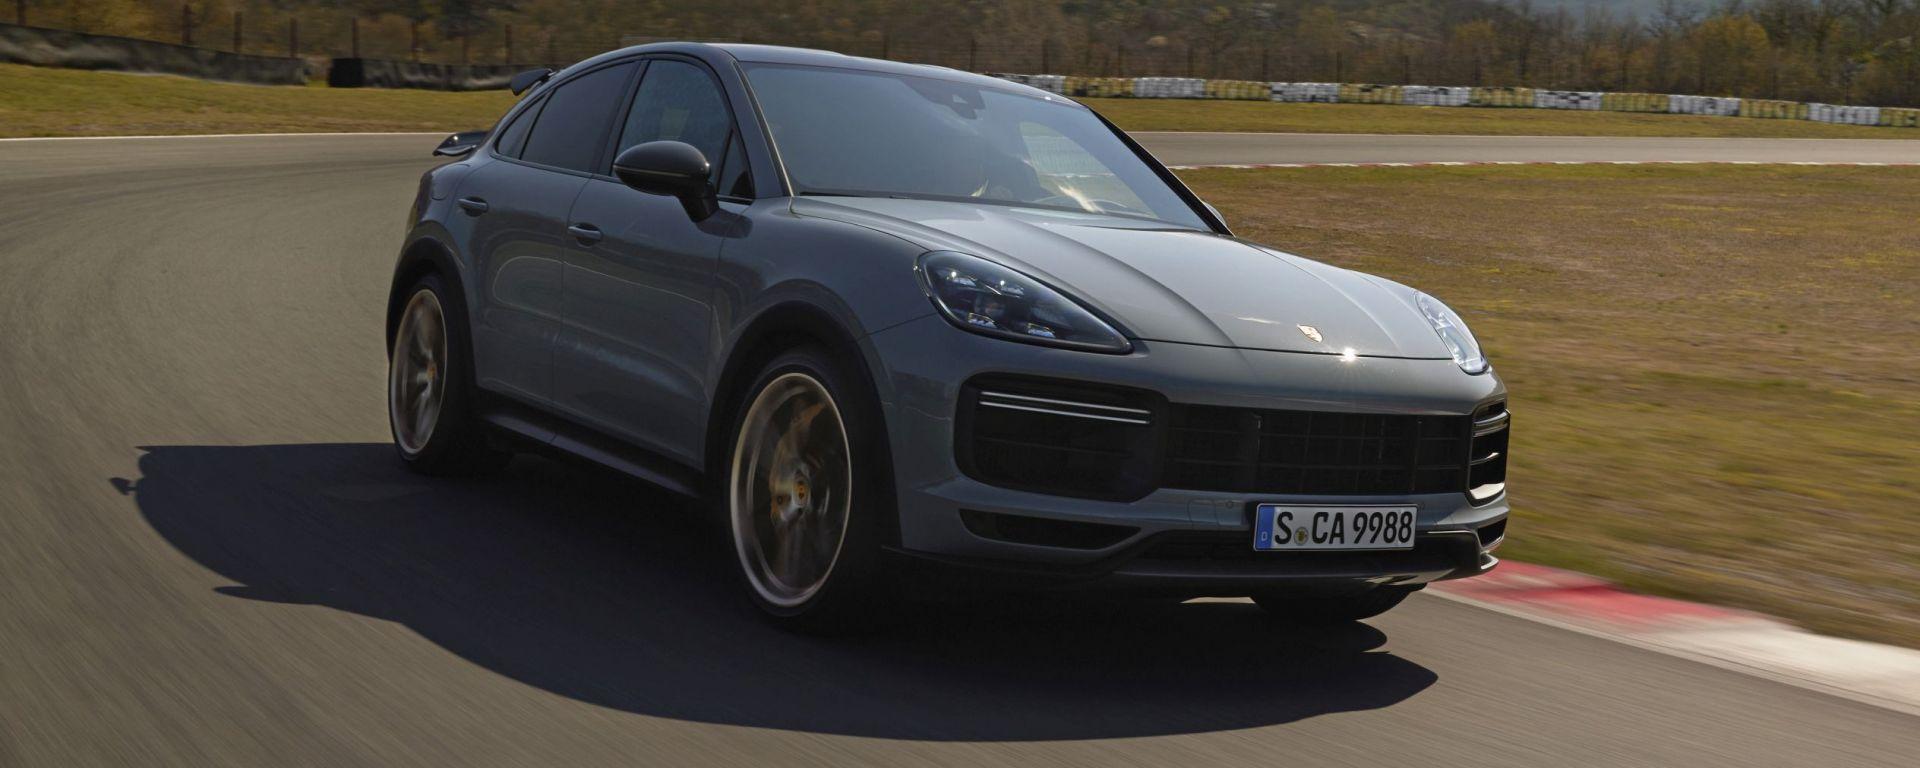 Nuova Porsche Cayenne Turbo GT: il SUV coupé da 640 CV